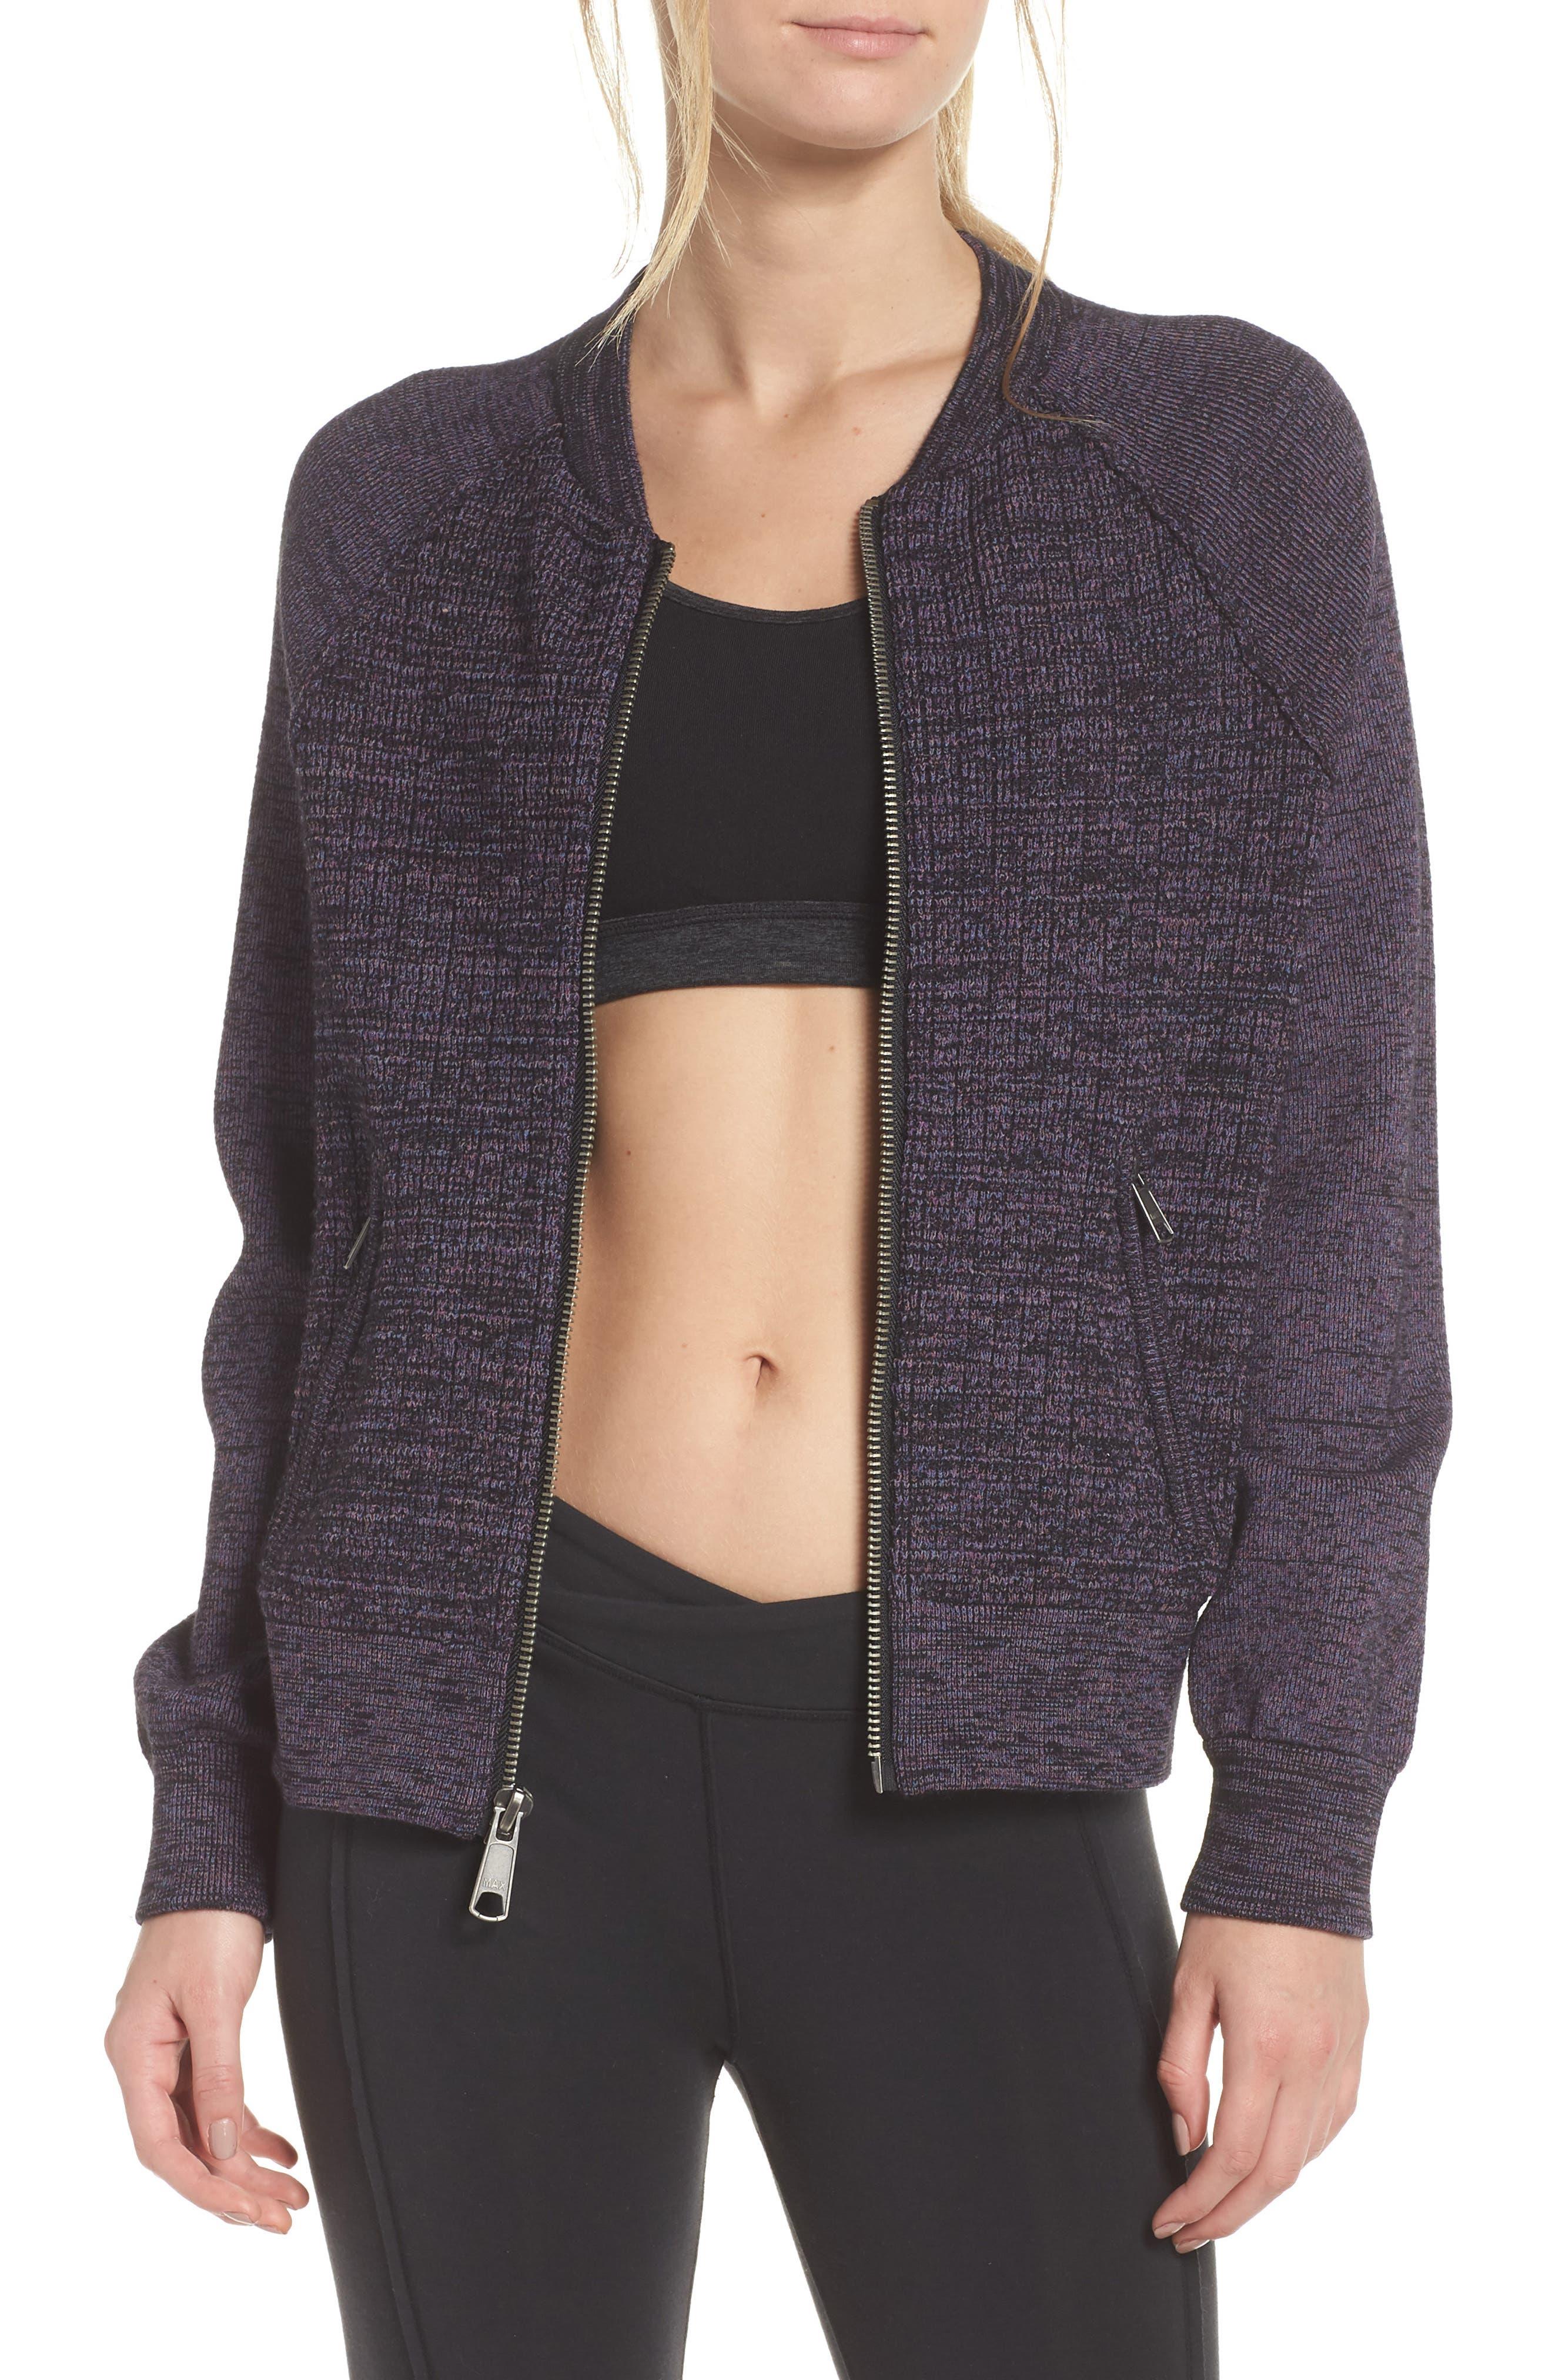 Naomi Sweatshirt,                         Main,                         color, BLACK COMBO